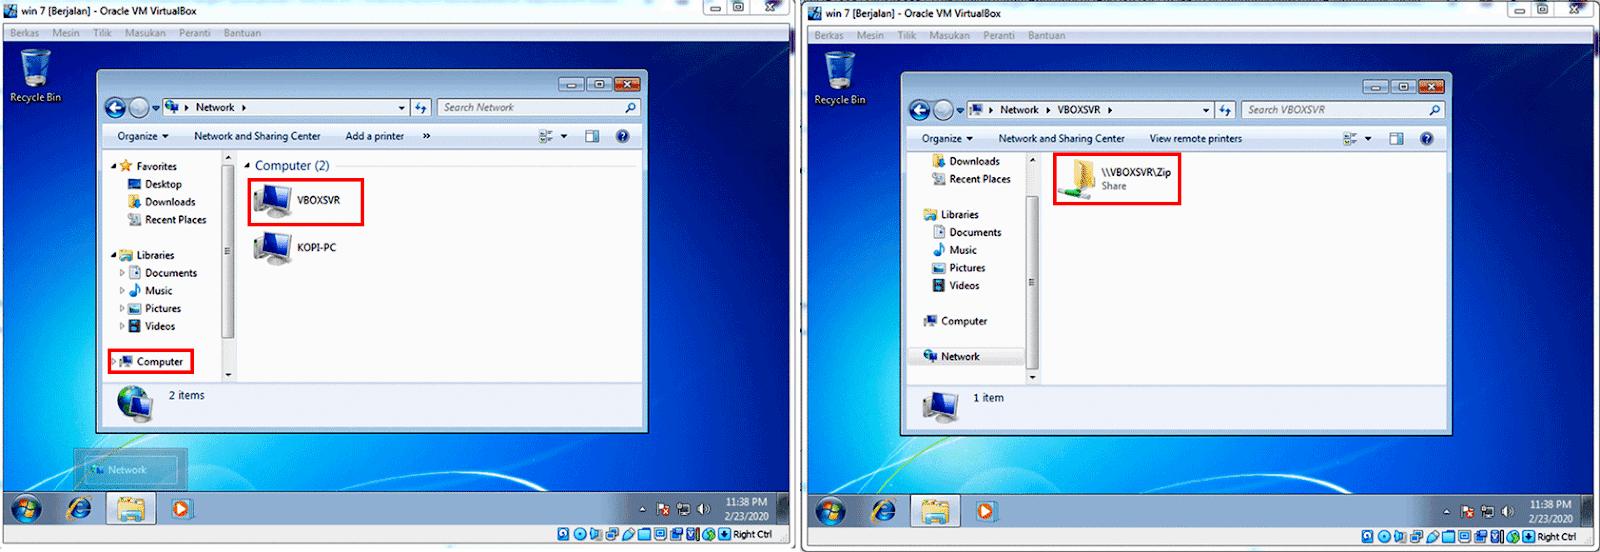 cara install mrt v2.60 dan cara aktivasi mrt v2.60 serta cara mengatasi masalah Zprotect encounters an unknown exception